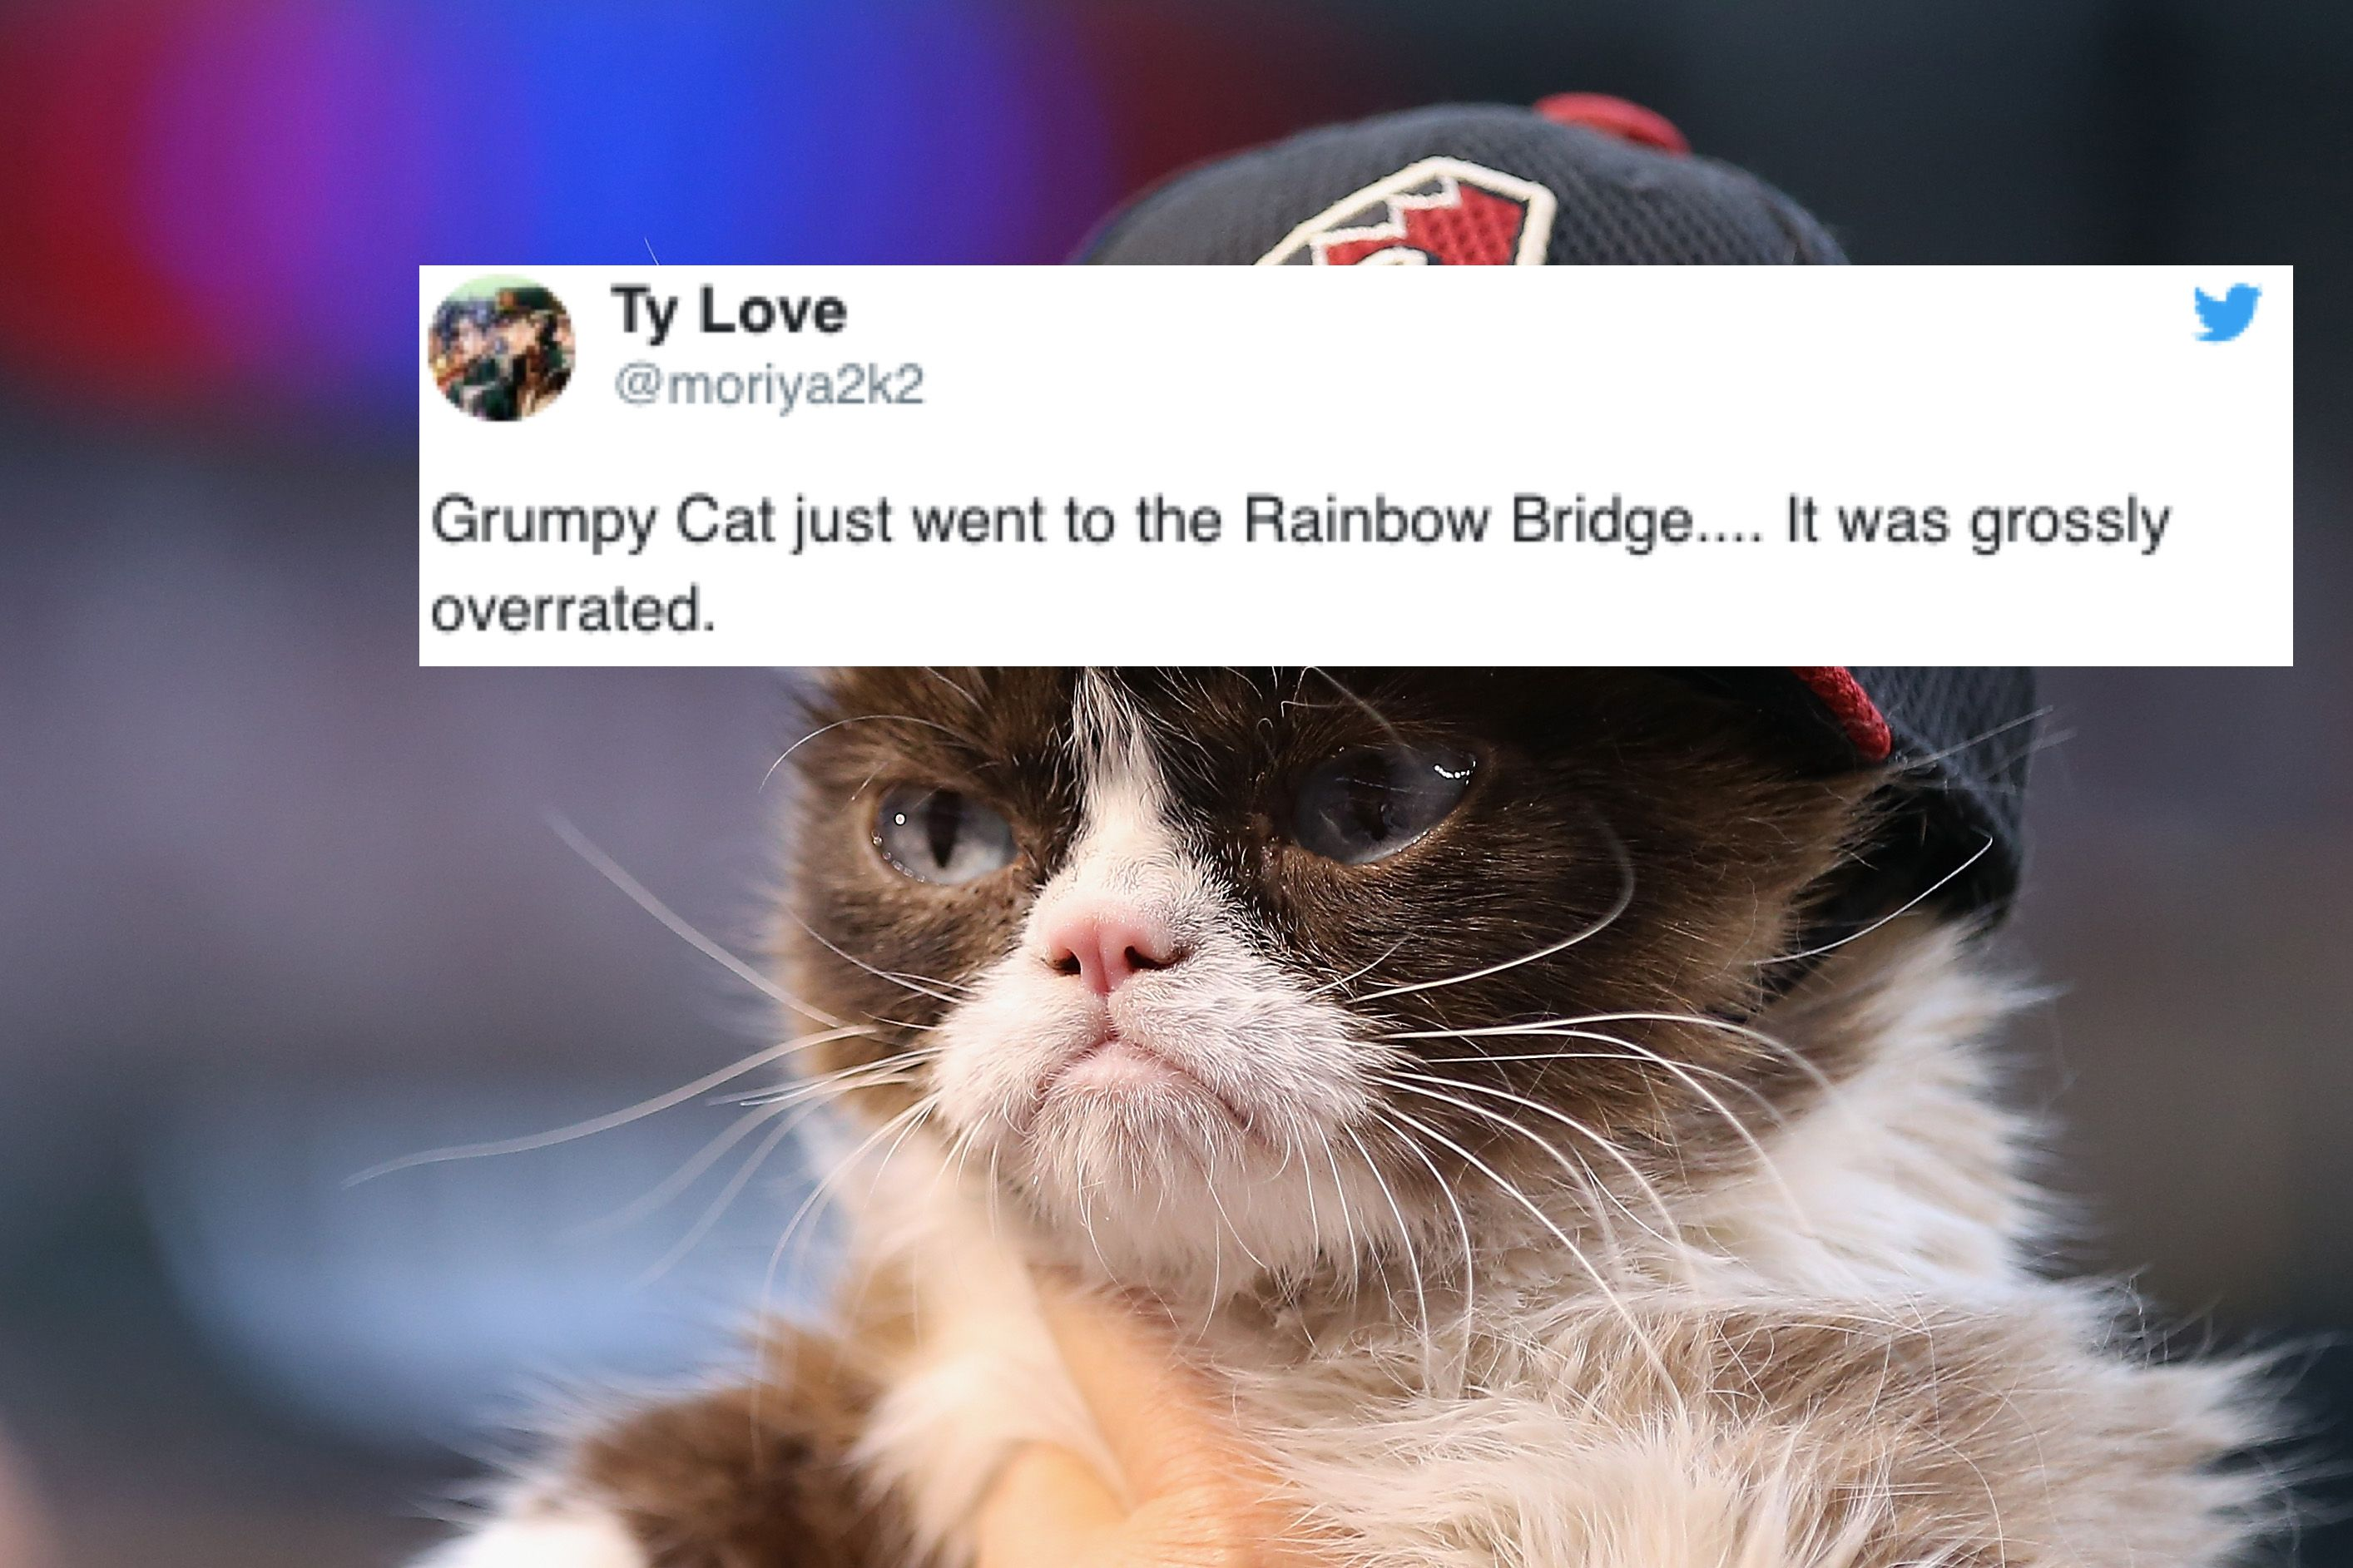 Grumpy Cat Heaven